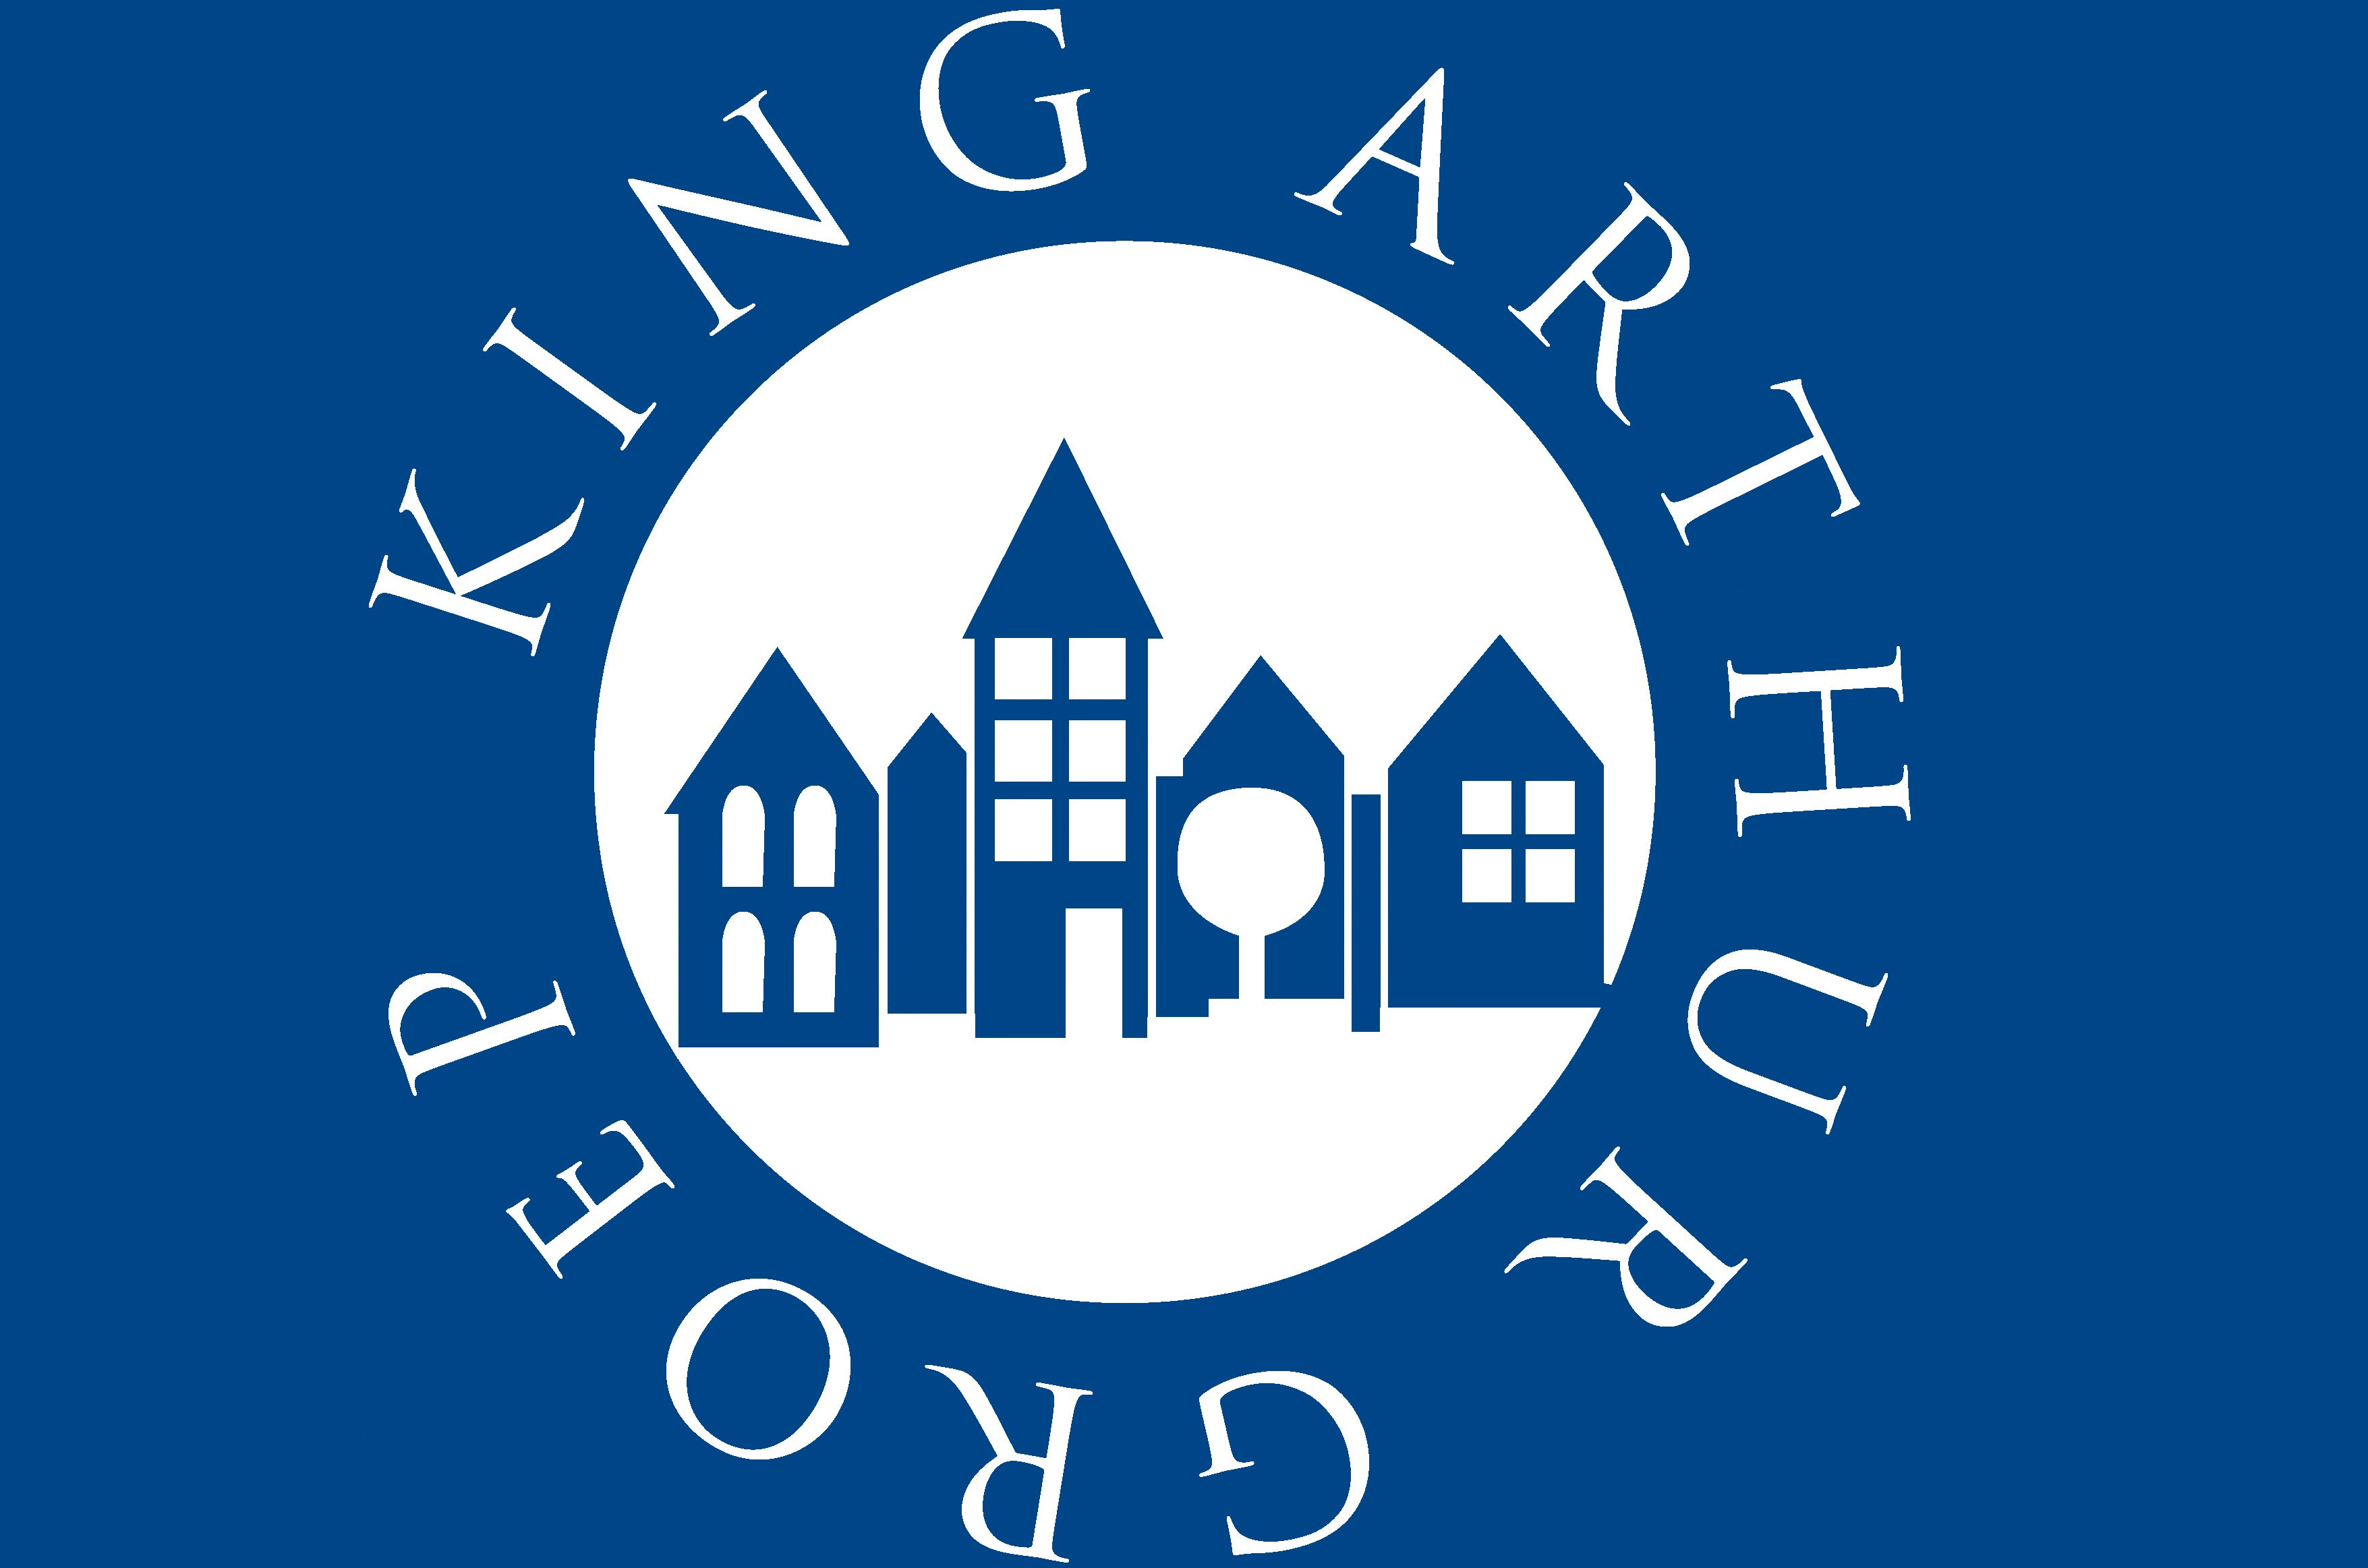 King Arthur Groep